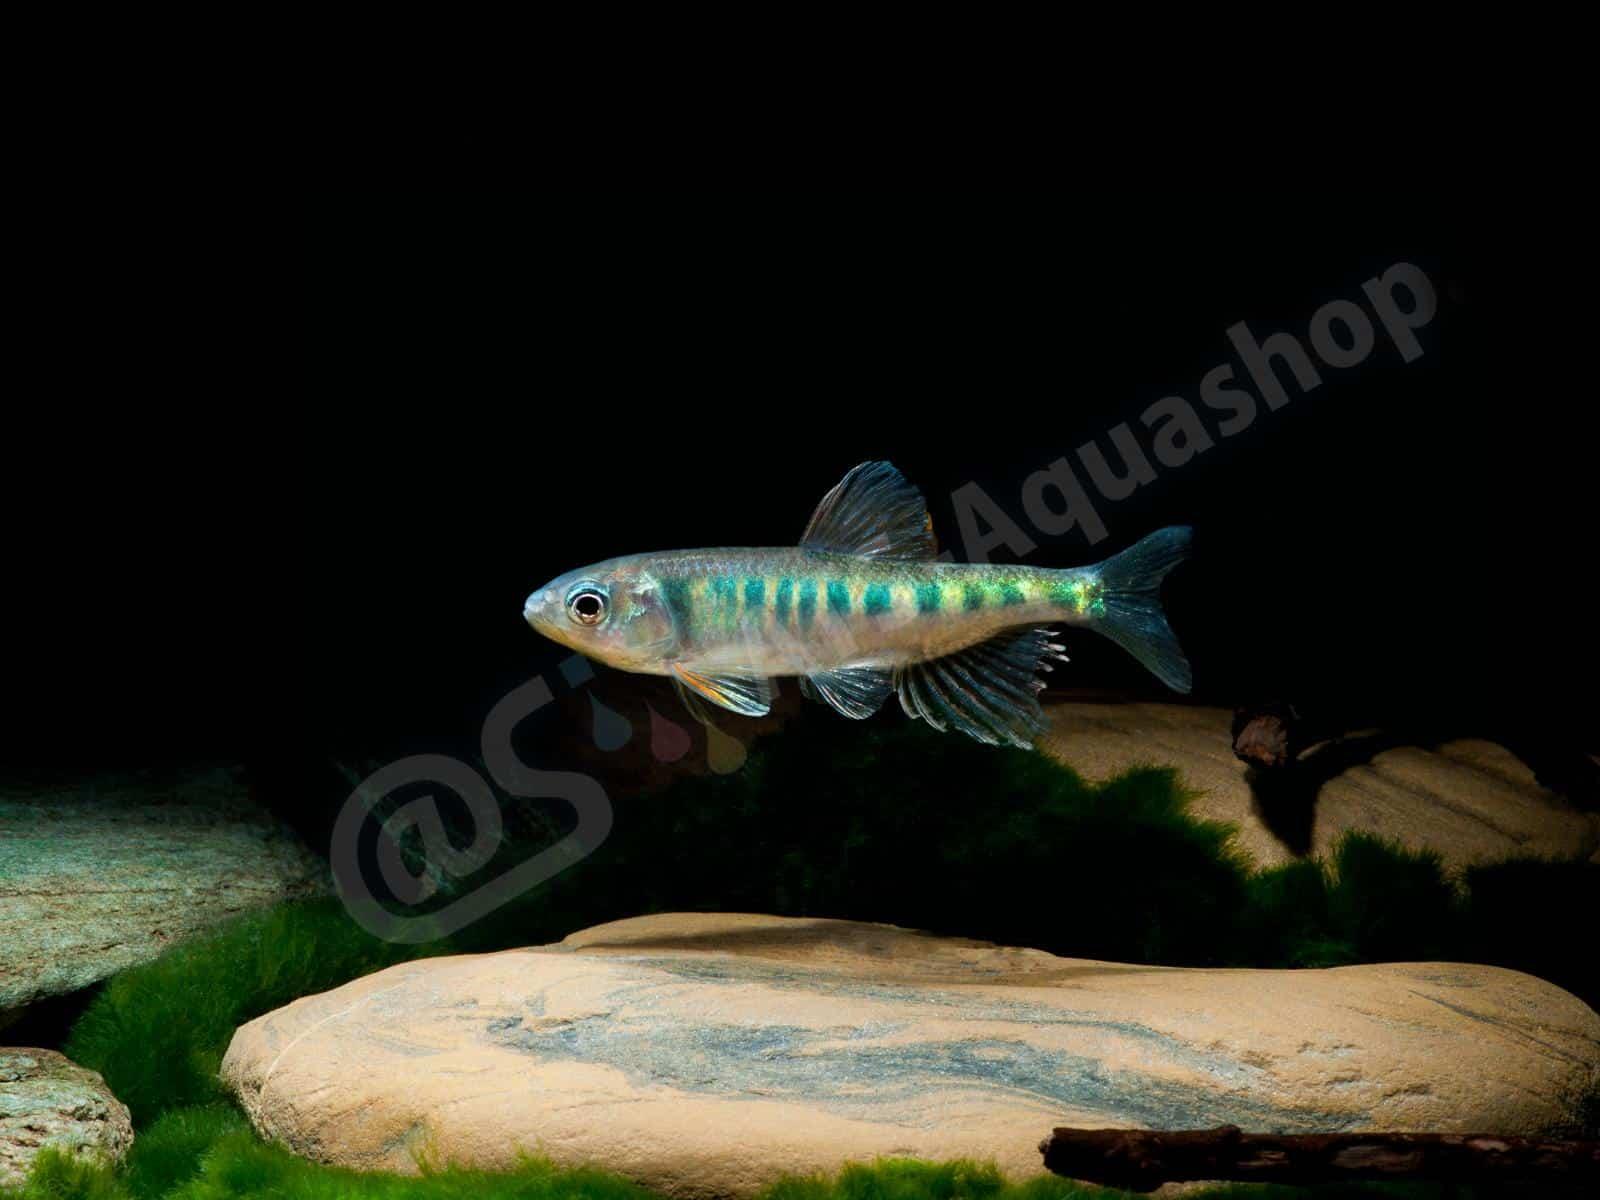 opsarius pulchellus enrico richter 0324 8